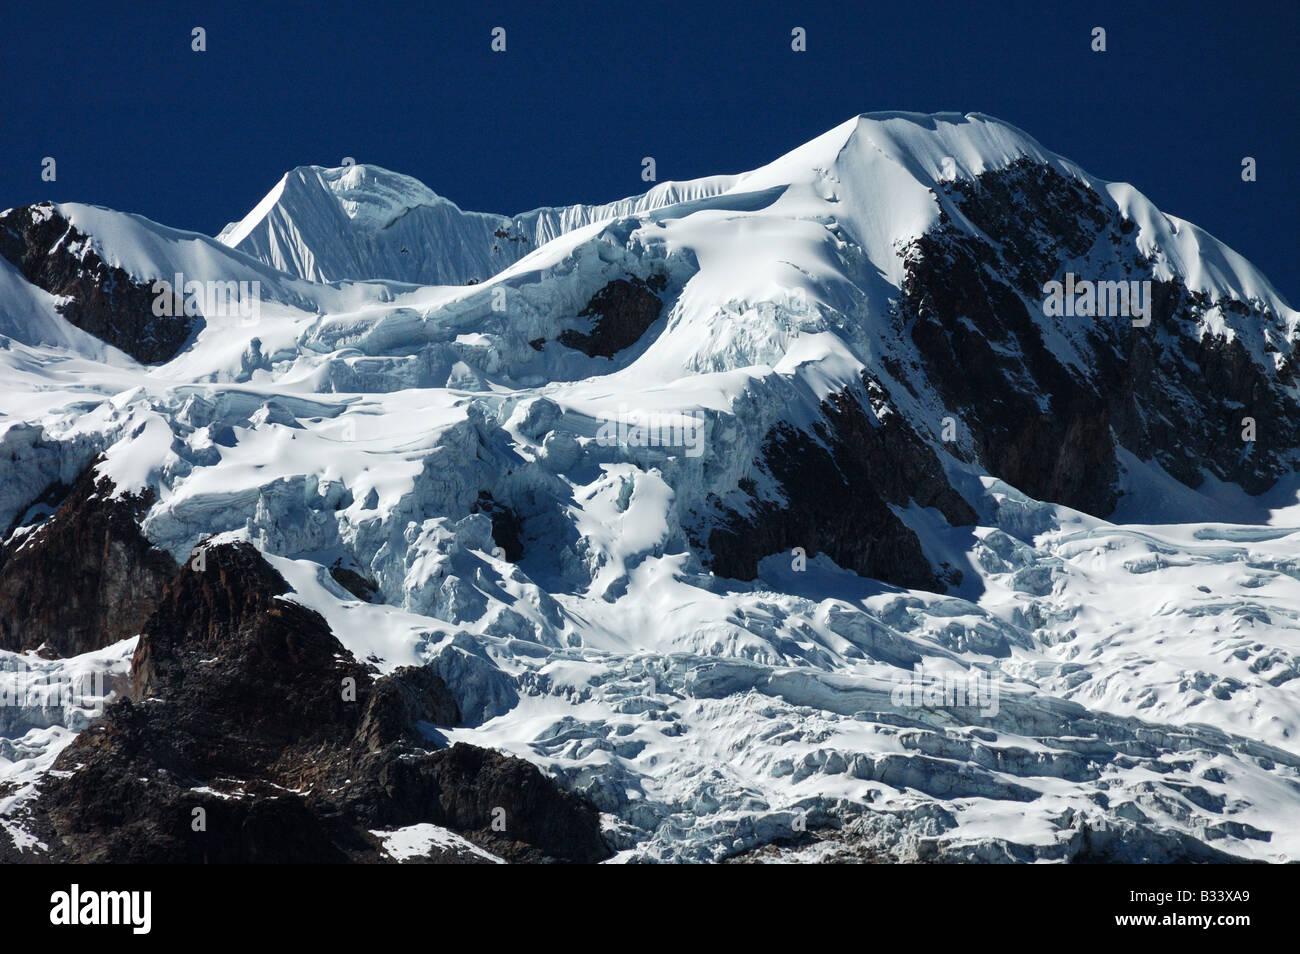 Mt Illampu 6368m Bolivia South America - Stock Image